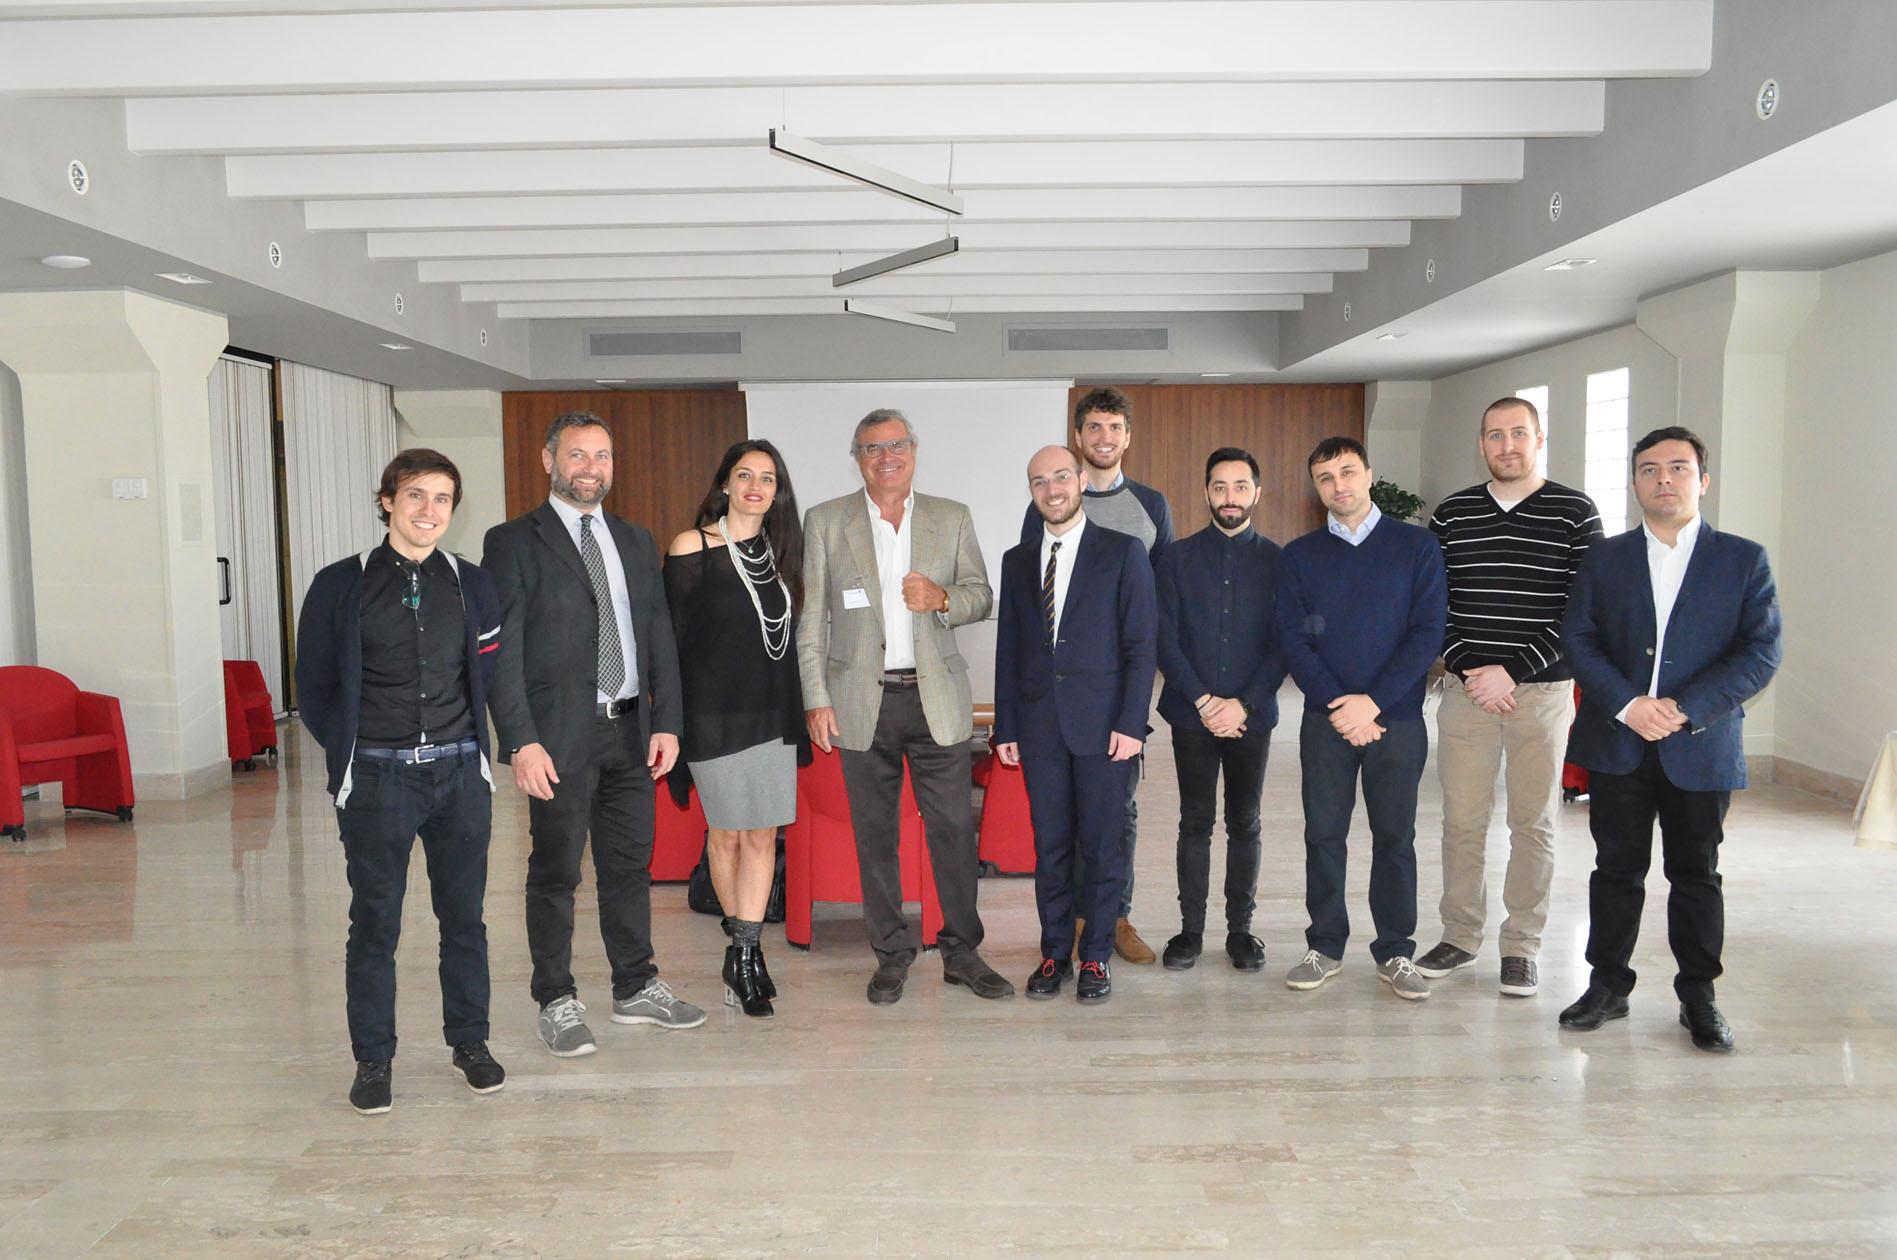 Higher Education, Aviointeriors signs a Memorandum of Understanding with Regione Lazio, ENAC and University